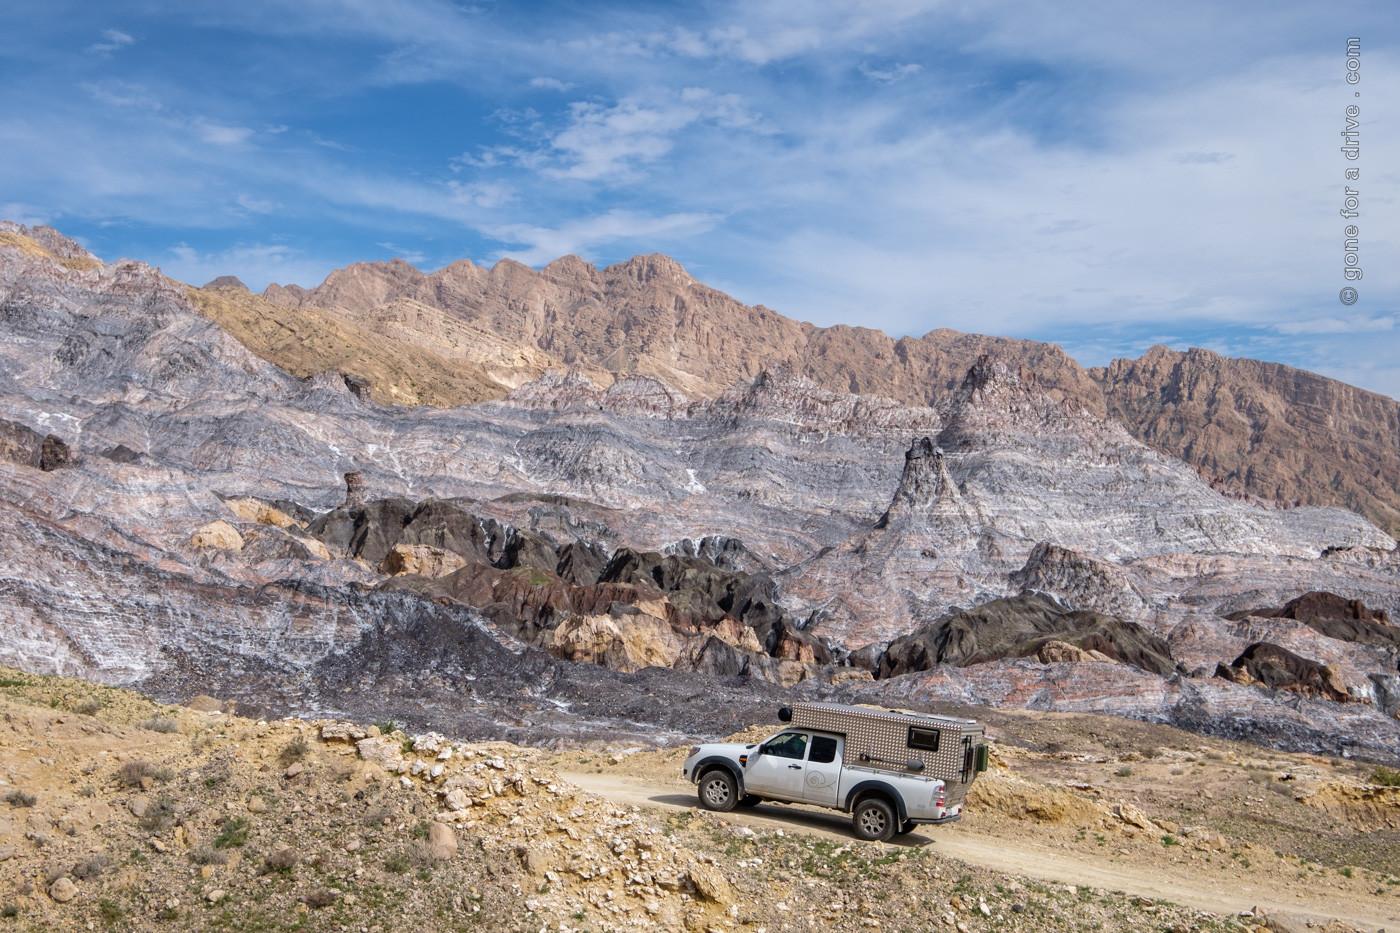 Allrad Camper mit Wohnkabine am Salzdom Kuh-e Namak